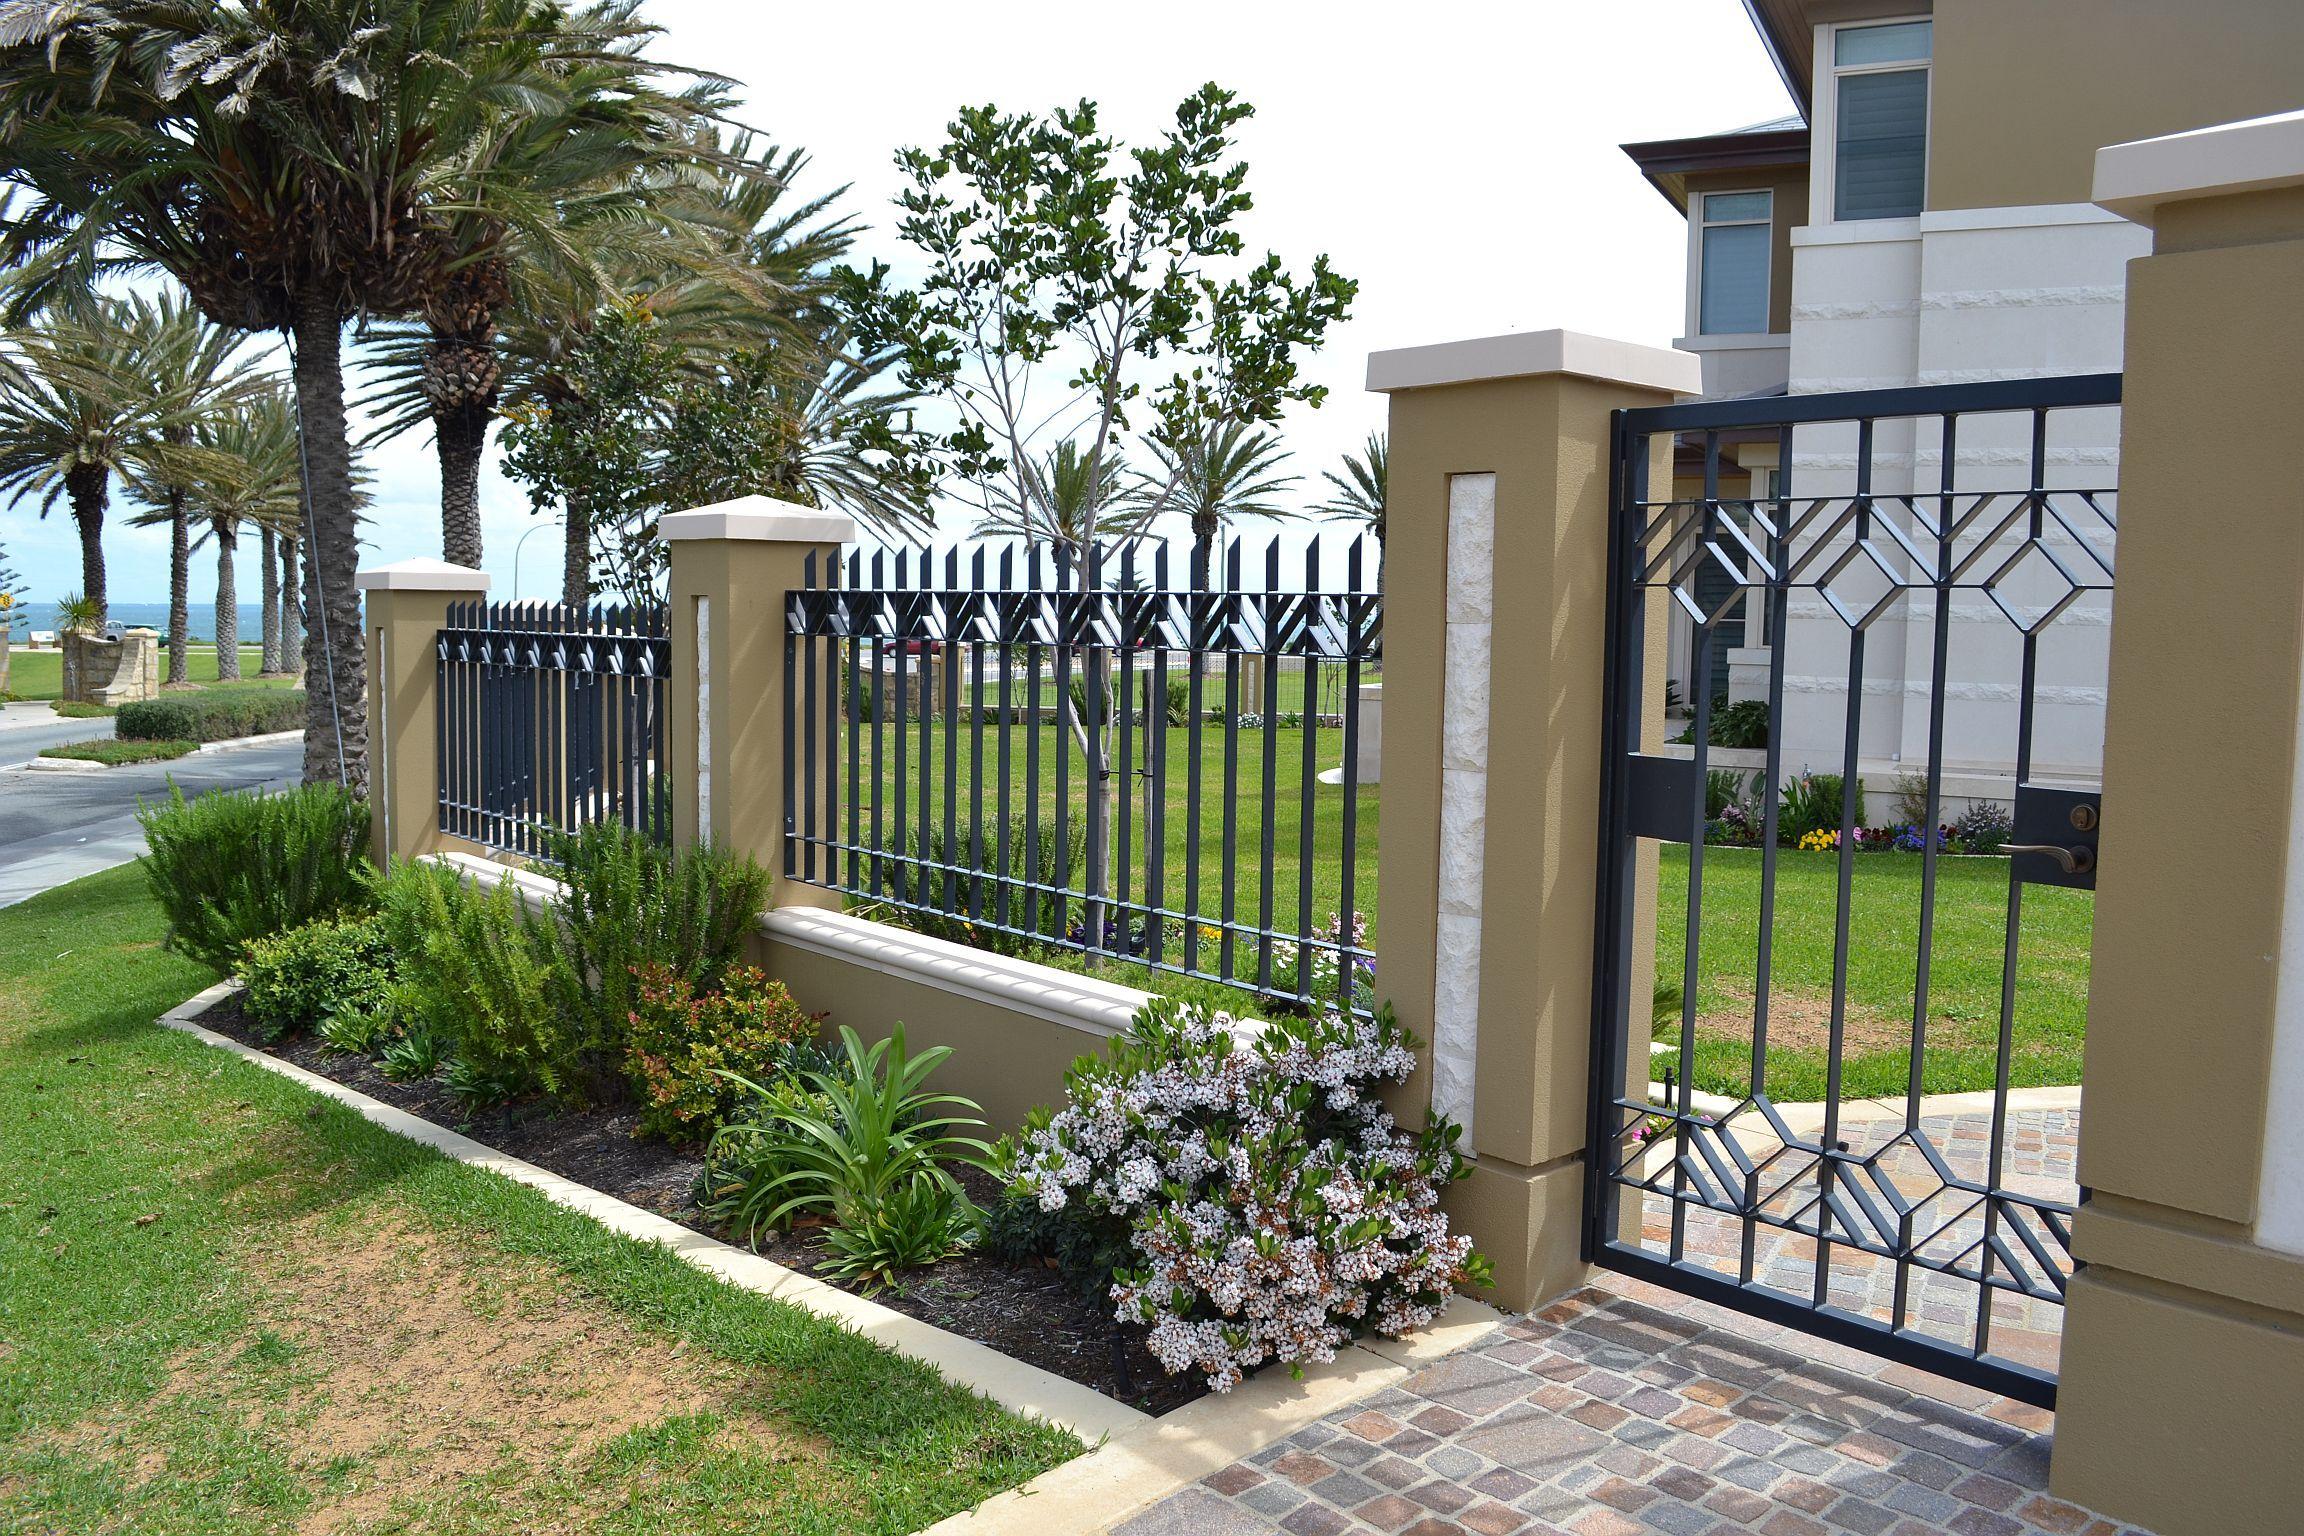 Best Kitchen Gallery: Ornate Metal Fence Fences Gates Screens Railings Pinterest of Fence Designs For Homes  on rachelxblog.com